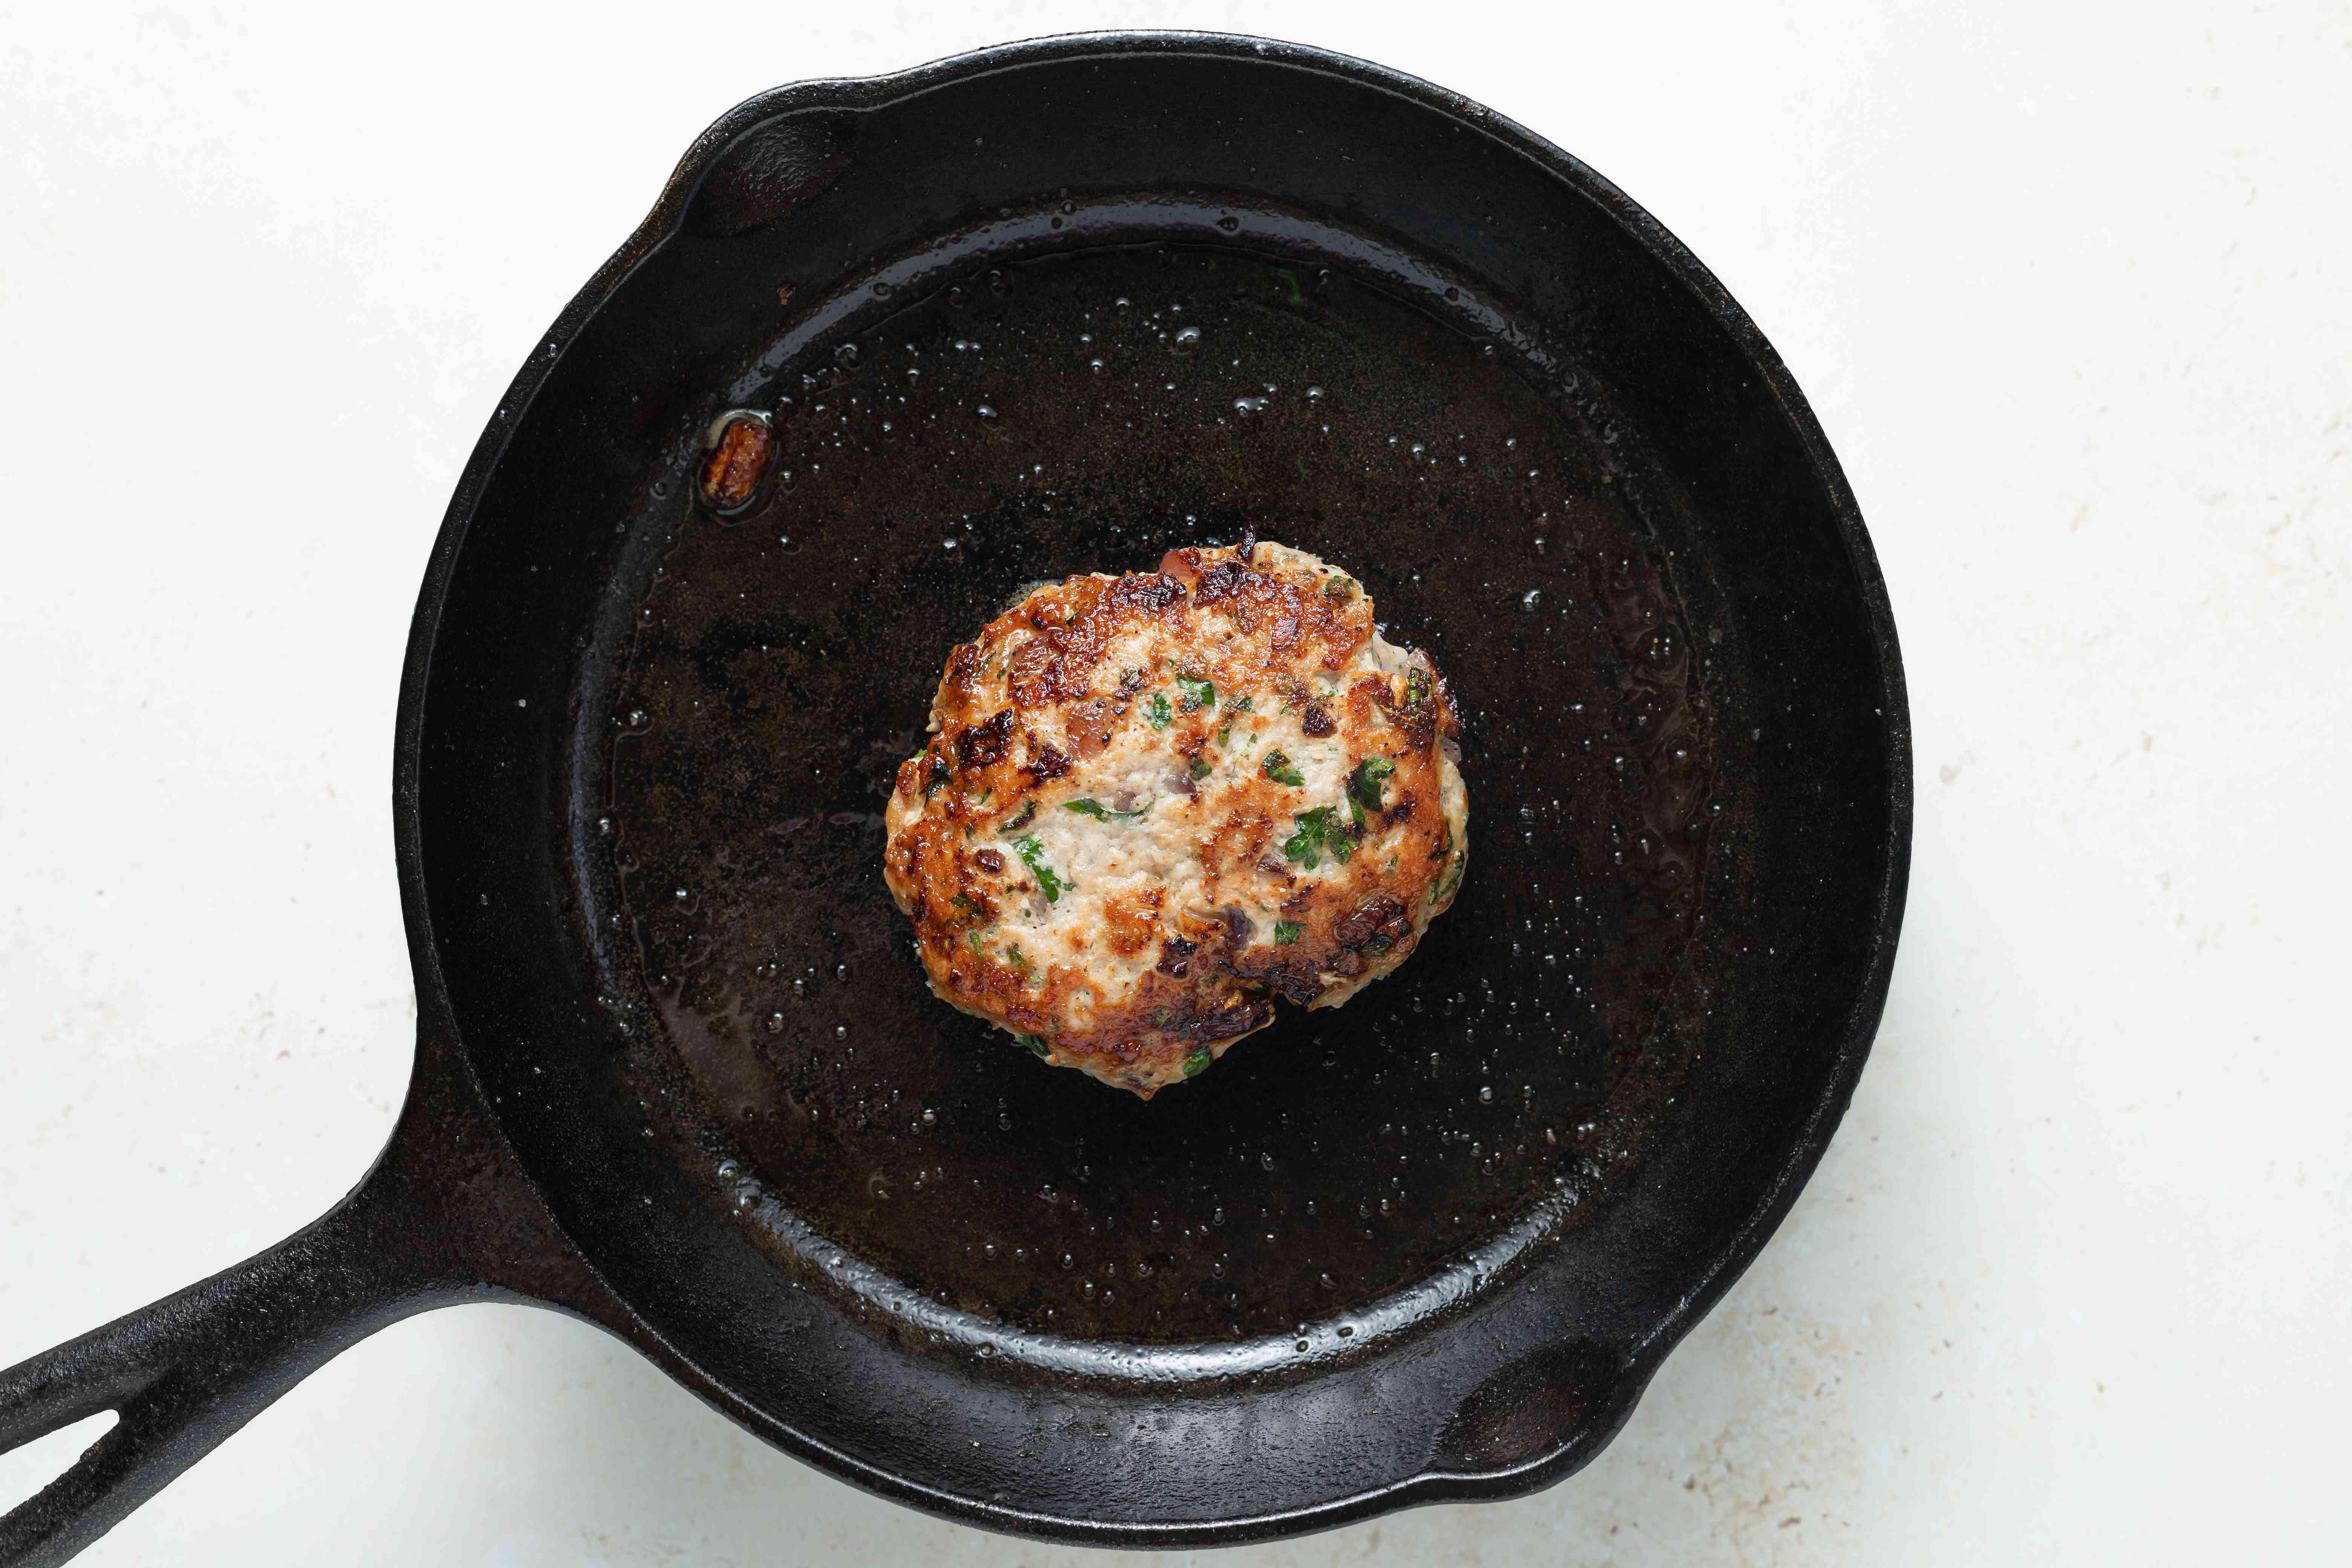 A cast iron skillet pan frying a turkey burger for a best turkey burger recipe.